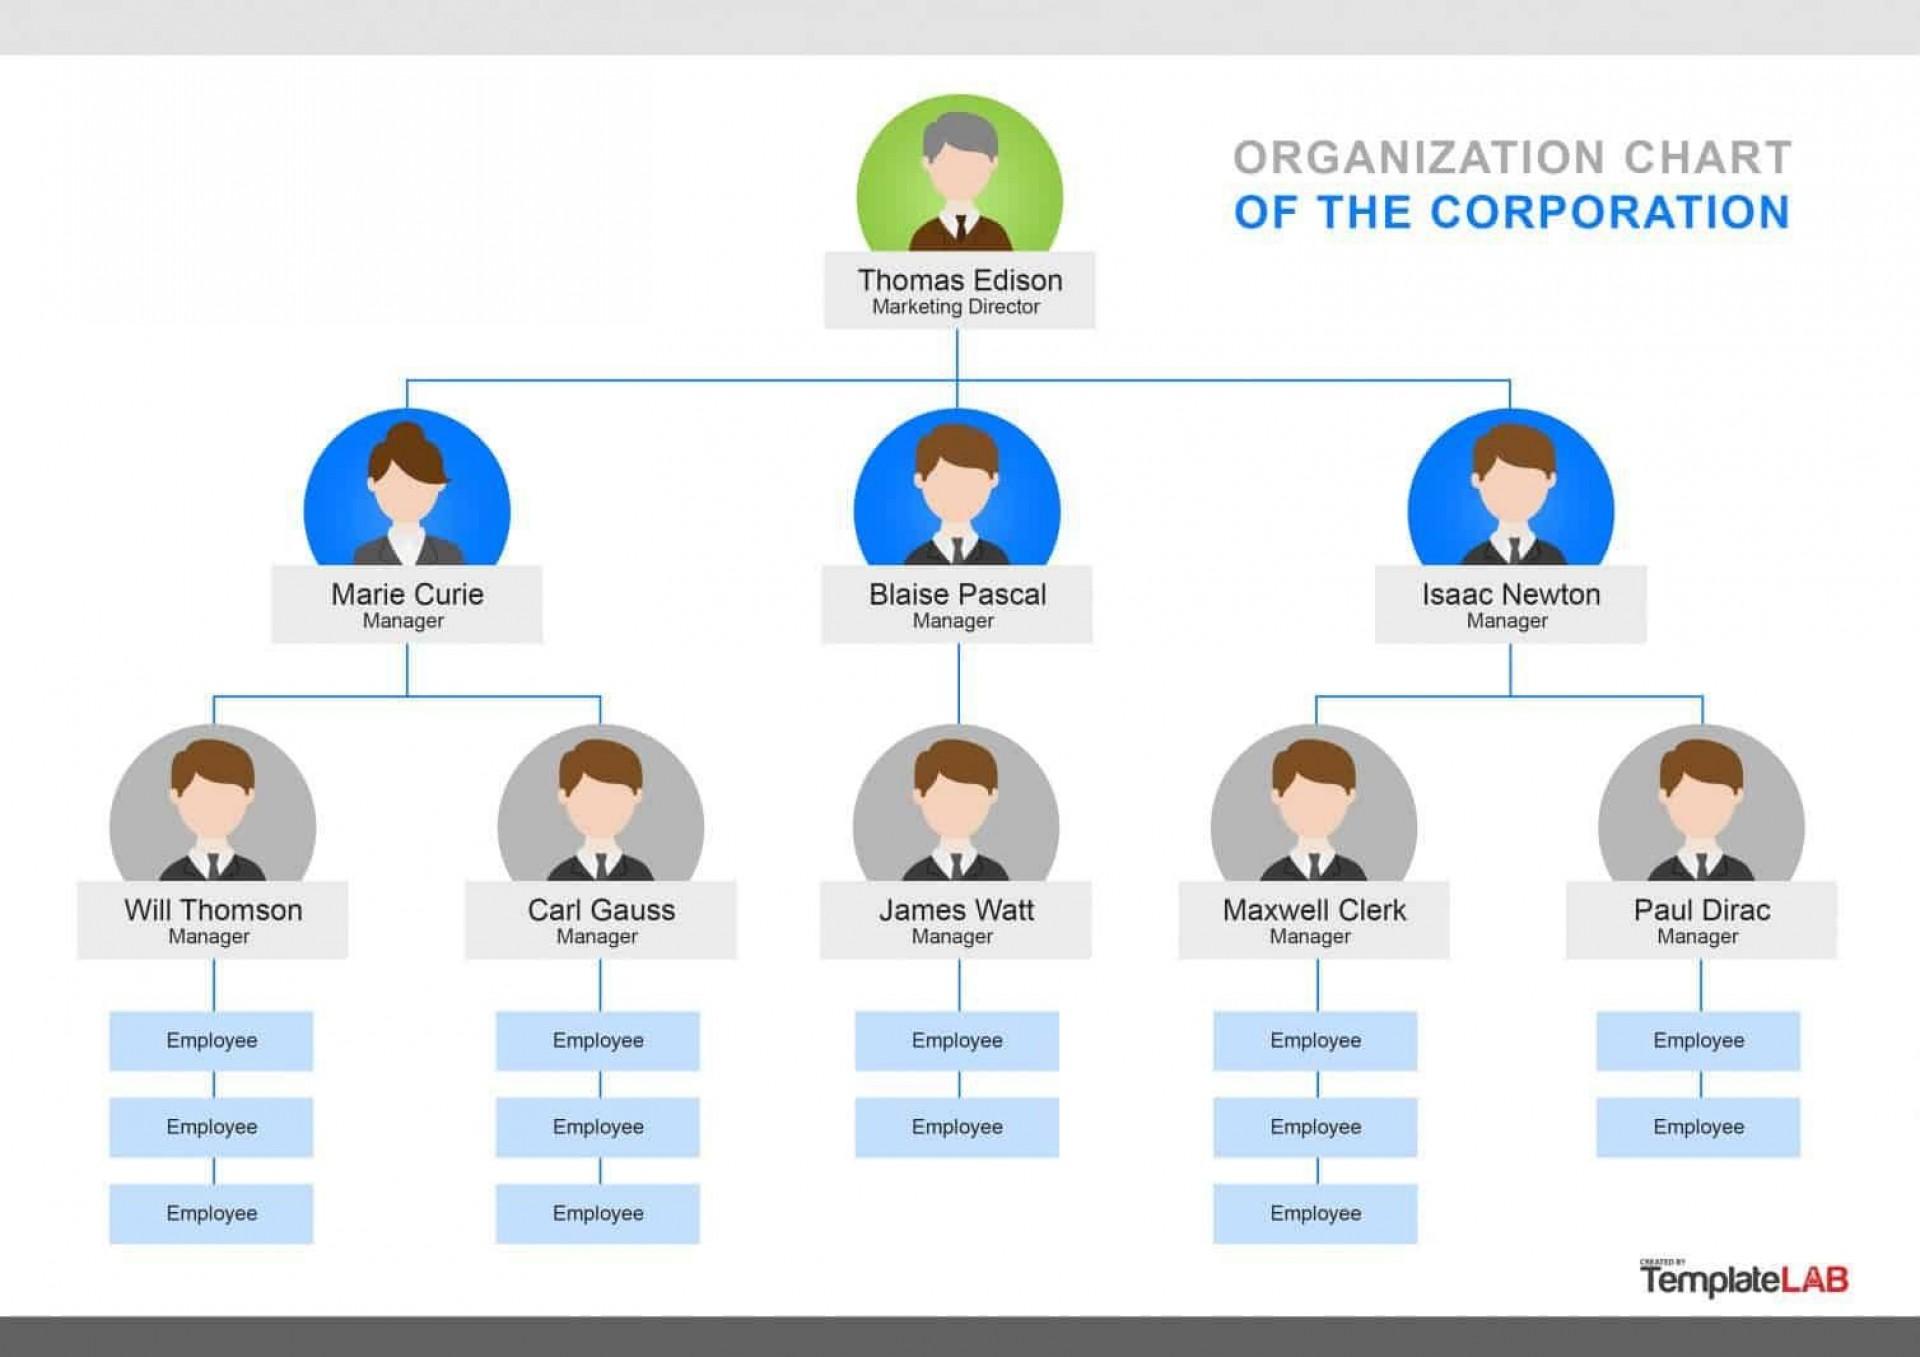 001 Fascinating Org Chart Template Powerpoint Photo  Organization Free Download Organizational 2010 20131920